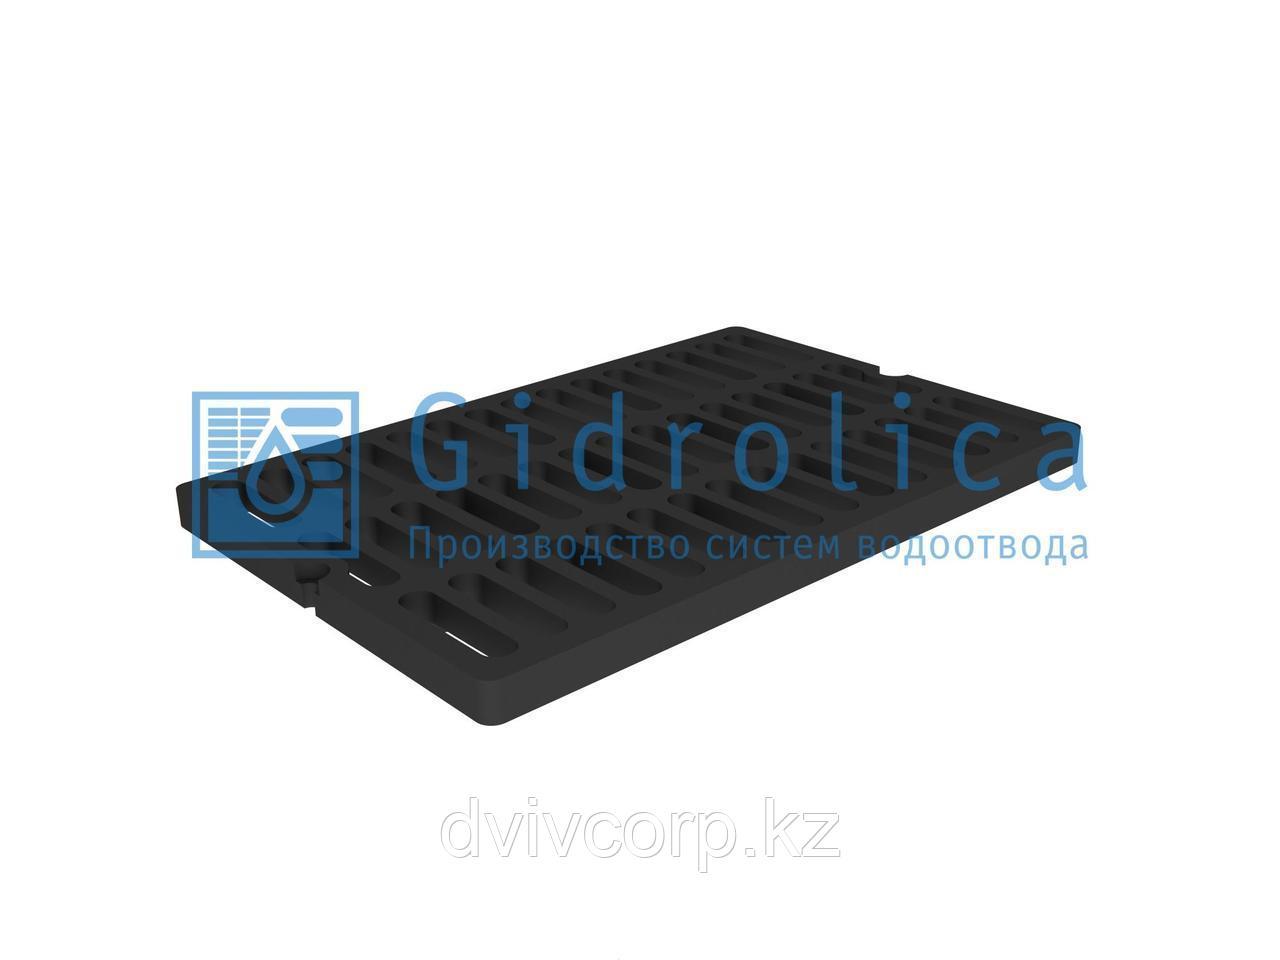 Арт. 5073D Решетка водоприемная СЧ 750*500*27 – чугунная, кл. D400